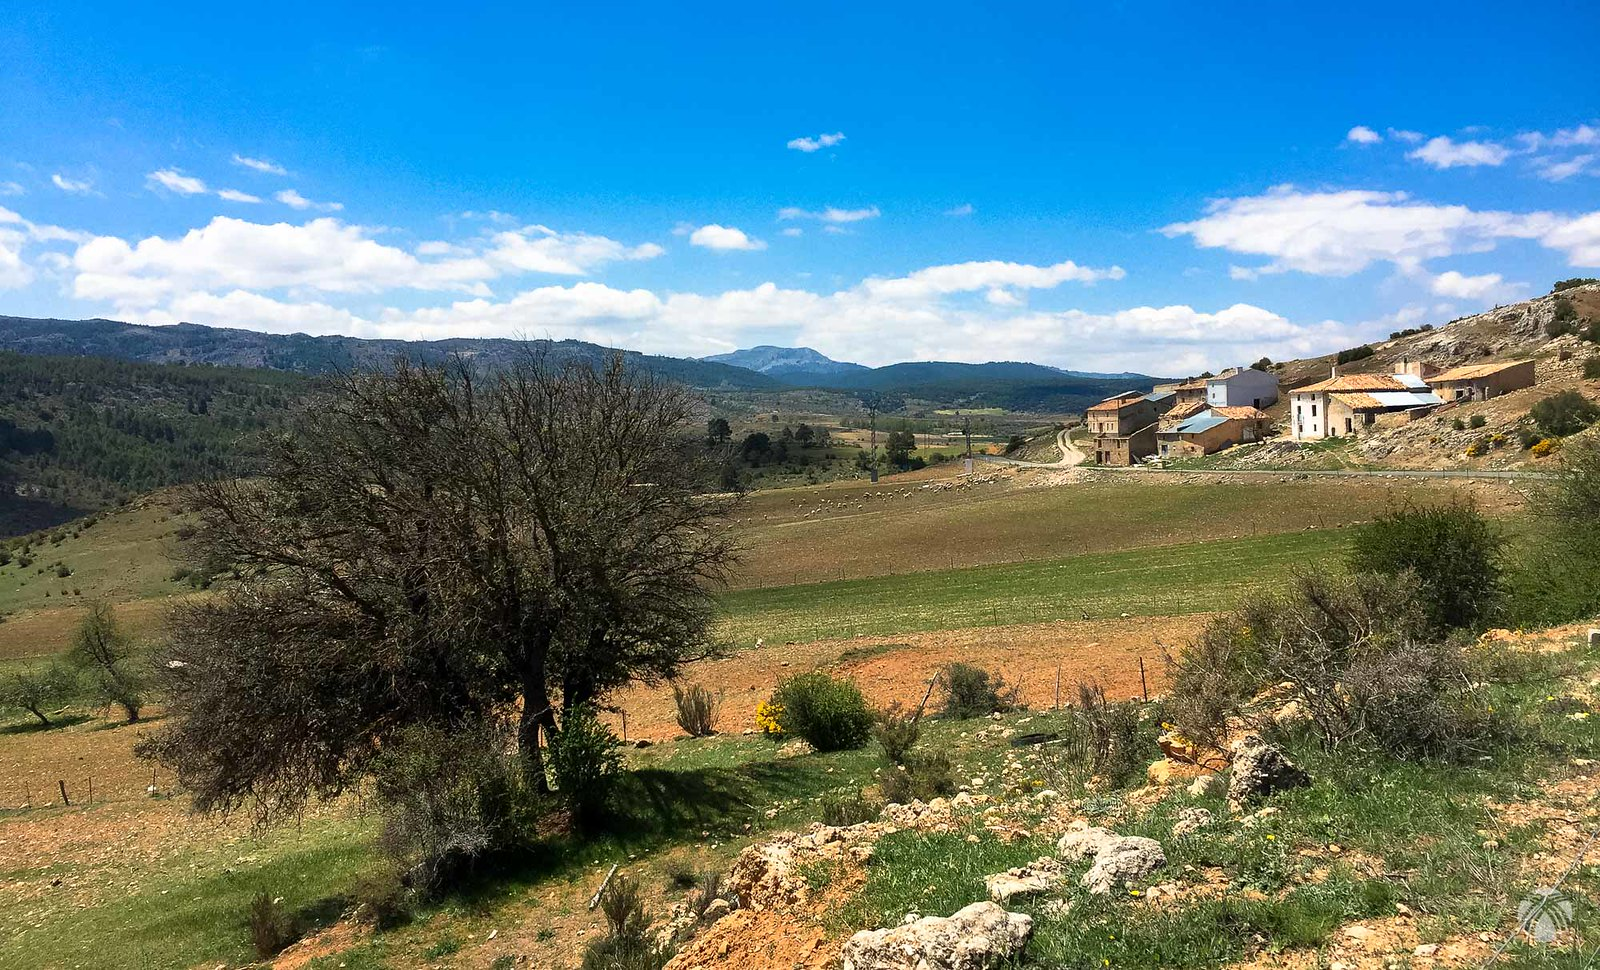 El valle de Huebras. Al fondo se aprecia la Guillimona